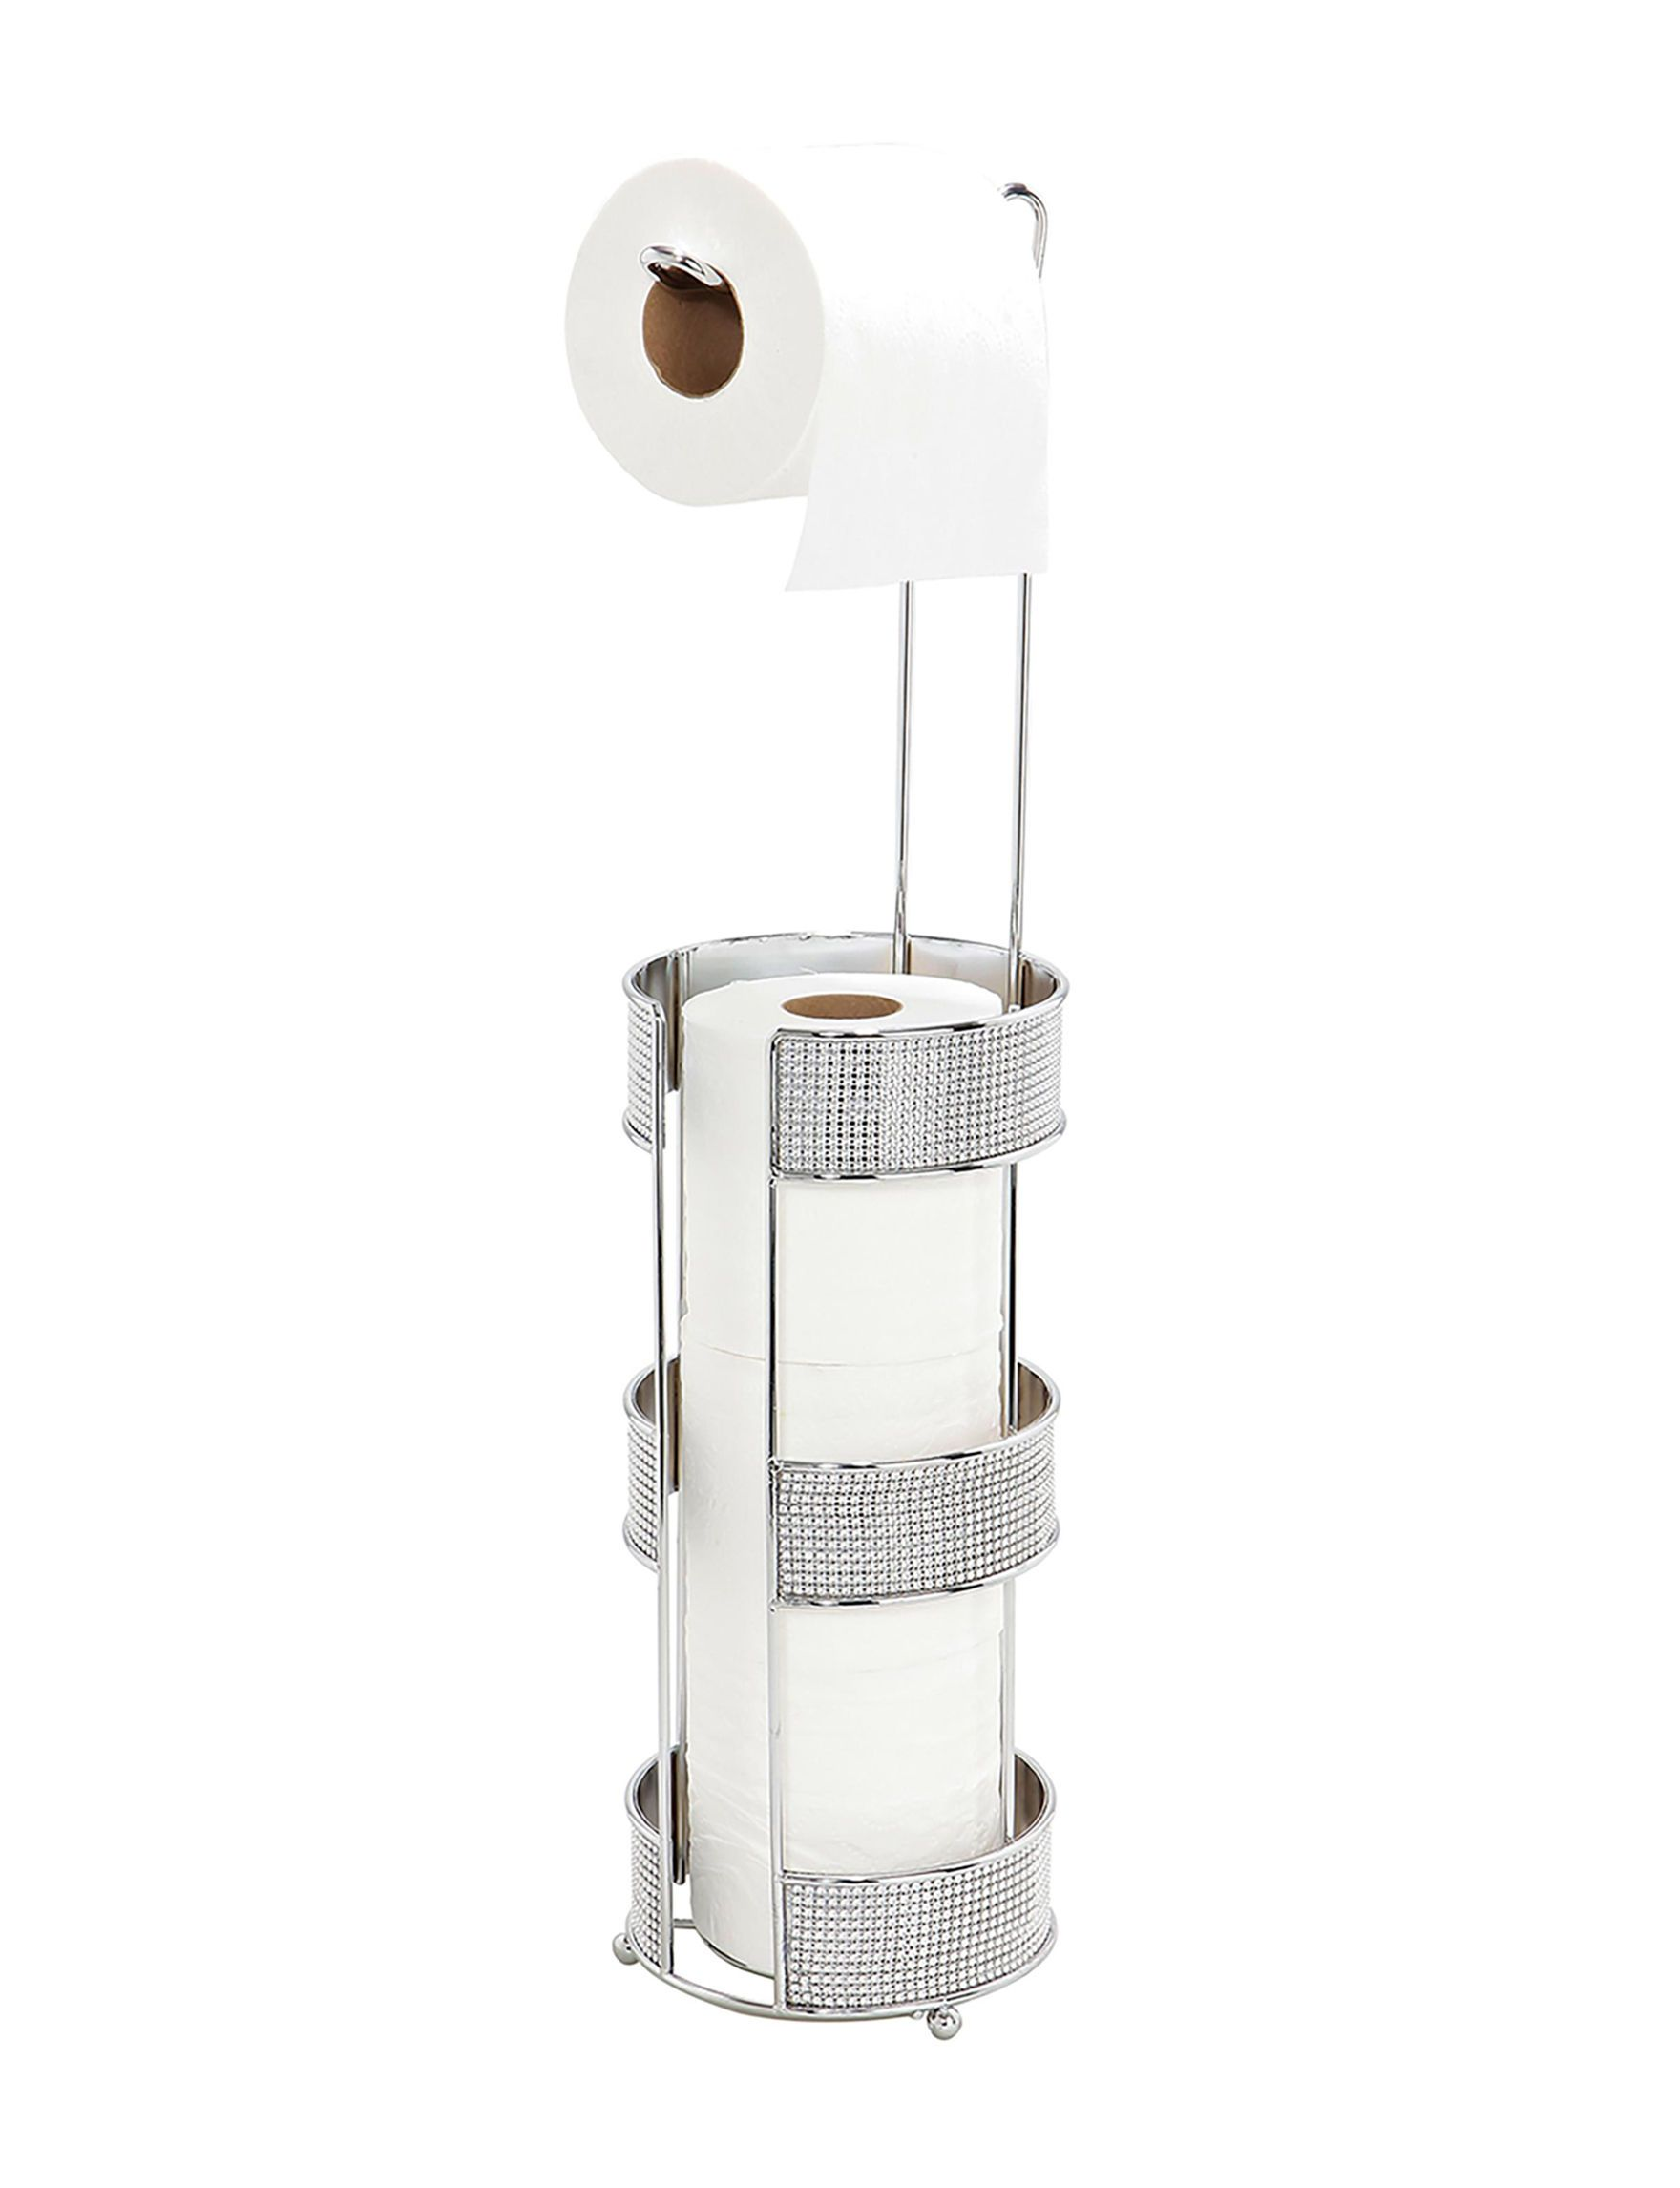 Bath Bliss Chrome Bath Accessories Toilet paper holder